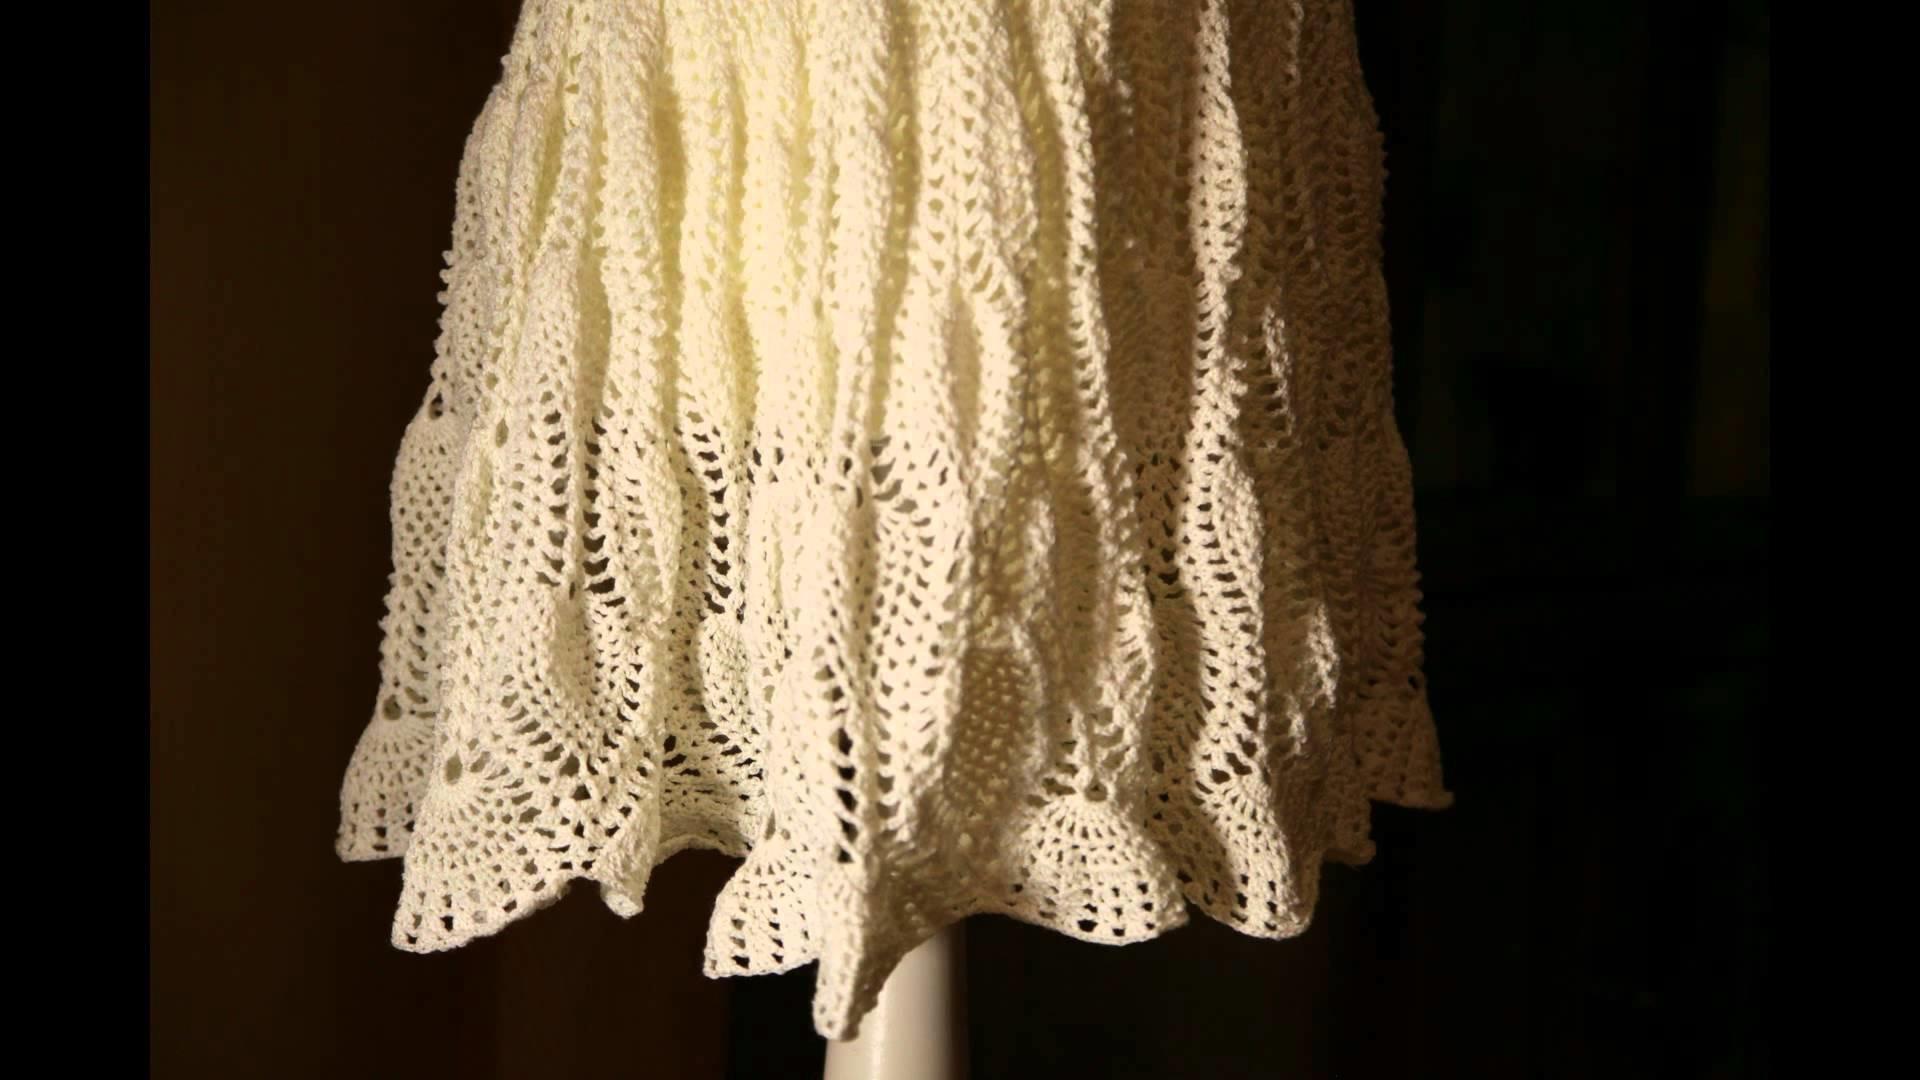 Pineapple Pattern Dress - HaekelnundStricken- Ananasmuster, Kleid